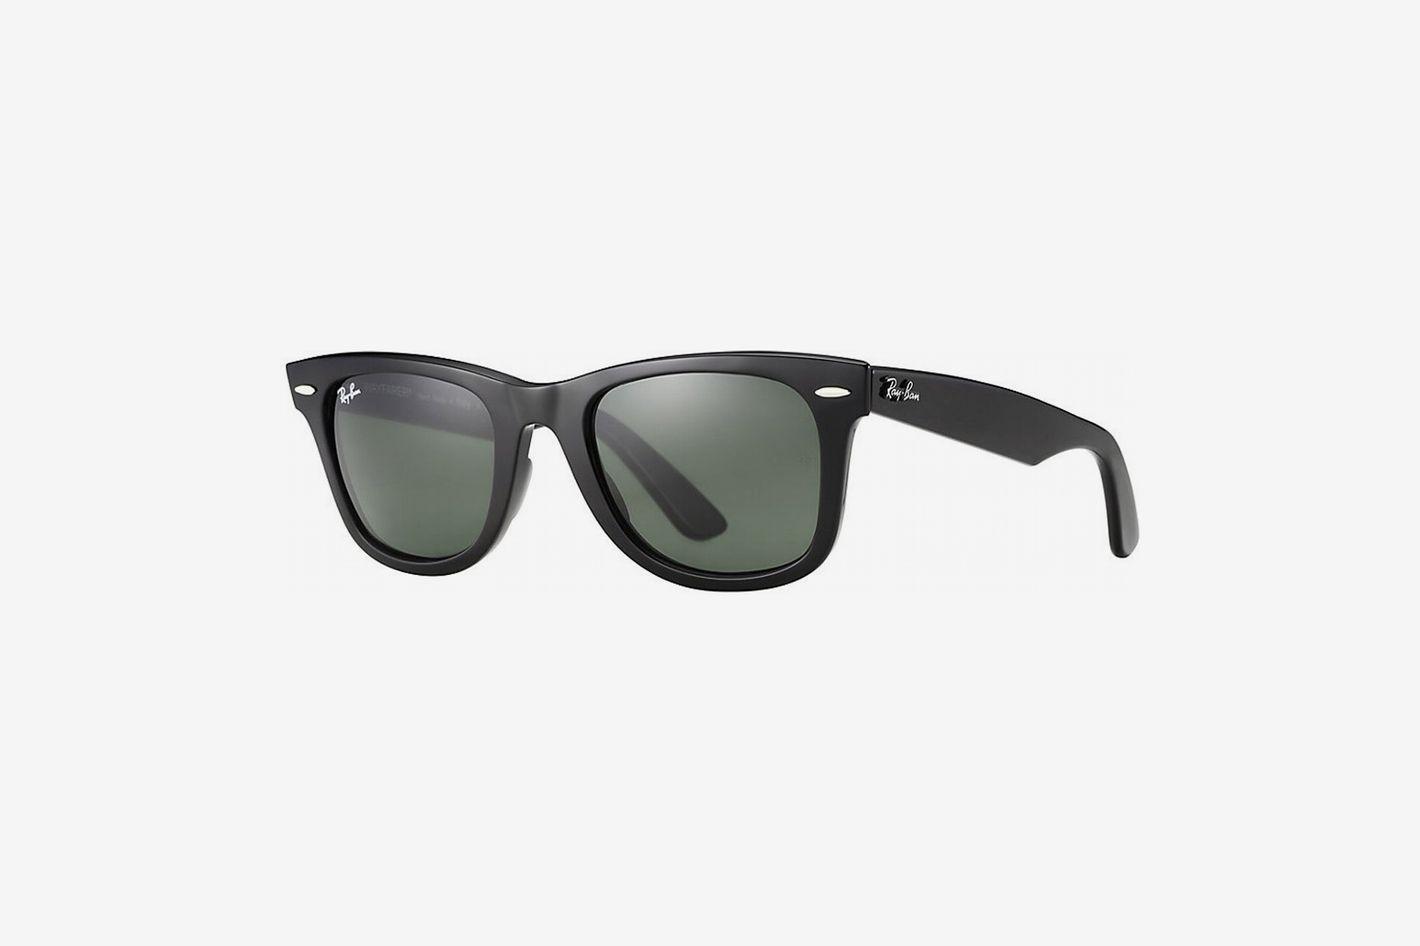 a2819fe50287 Ray-Ban Wayfarer RB2140 Square Sunglasses